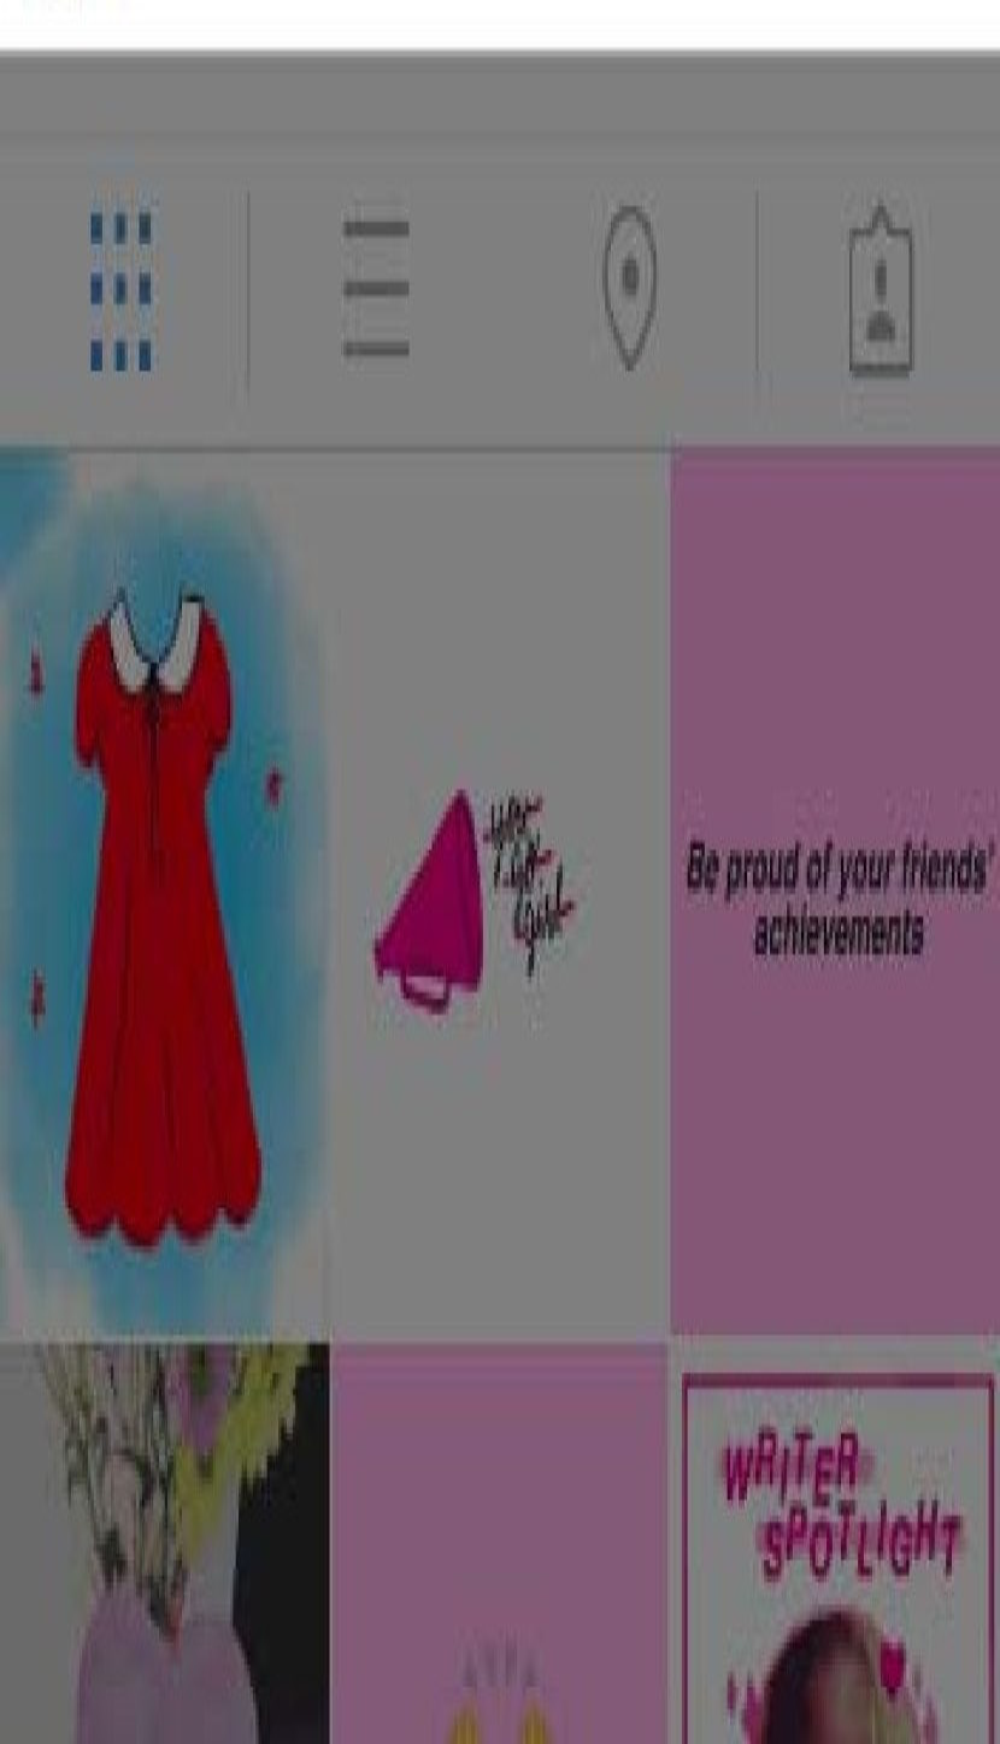 Instagram: Ξεκίνησαν οι δοκιμές πολλαπλών λογαριασμών στο iOS